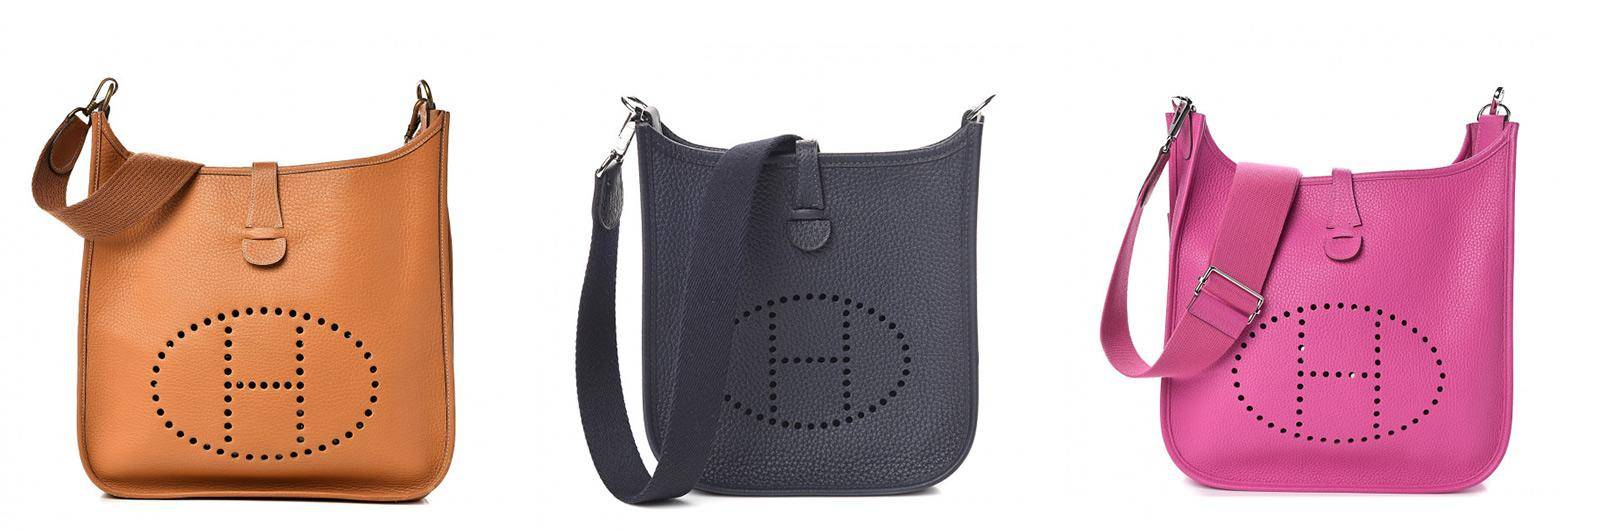 Hermes Evelyn bags in 3 colors